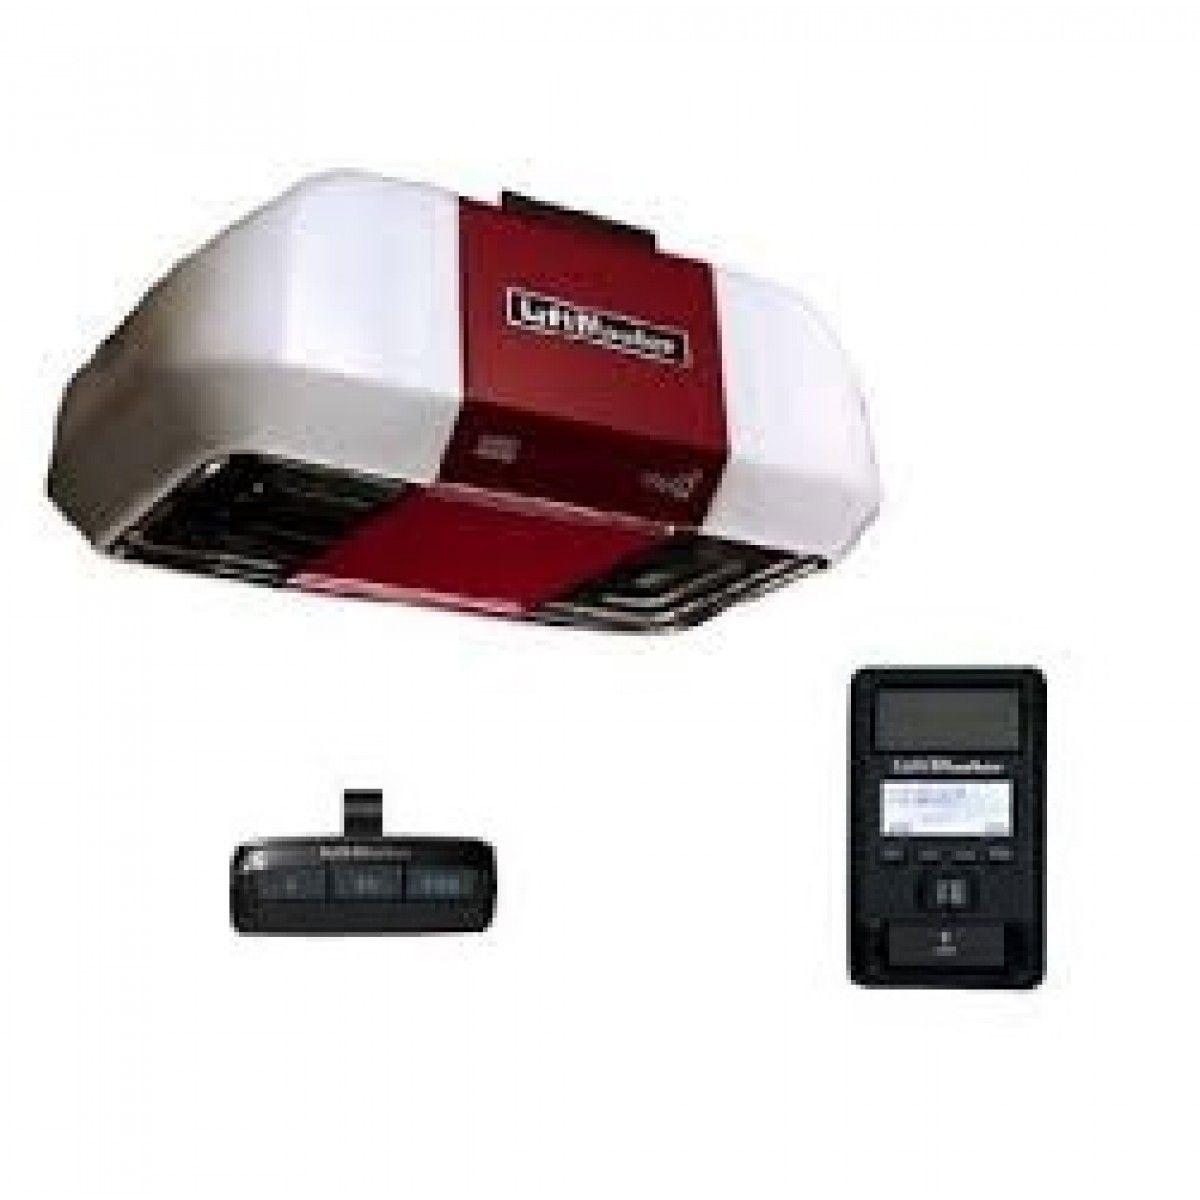 Liftmaster 8550w Dc Backup Capable Belt Drive Wi Fi Garage Opener